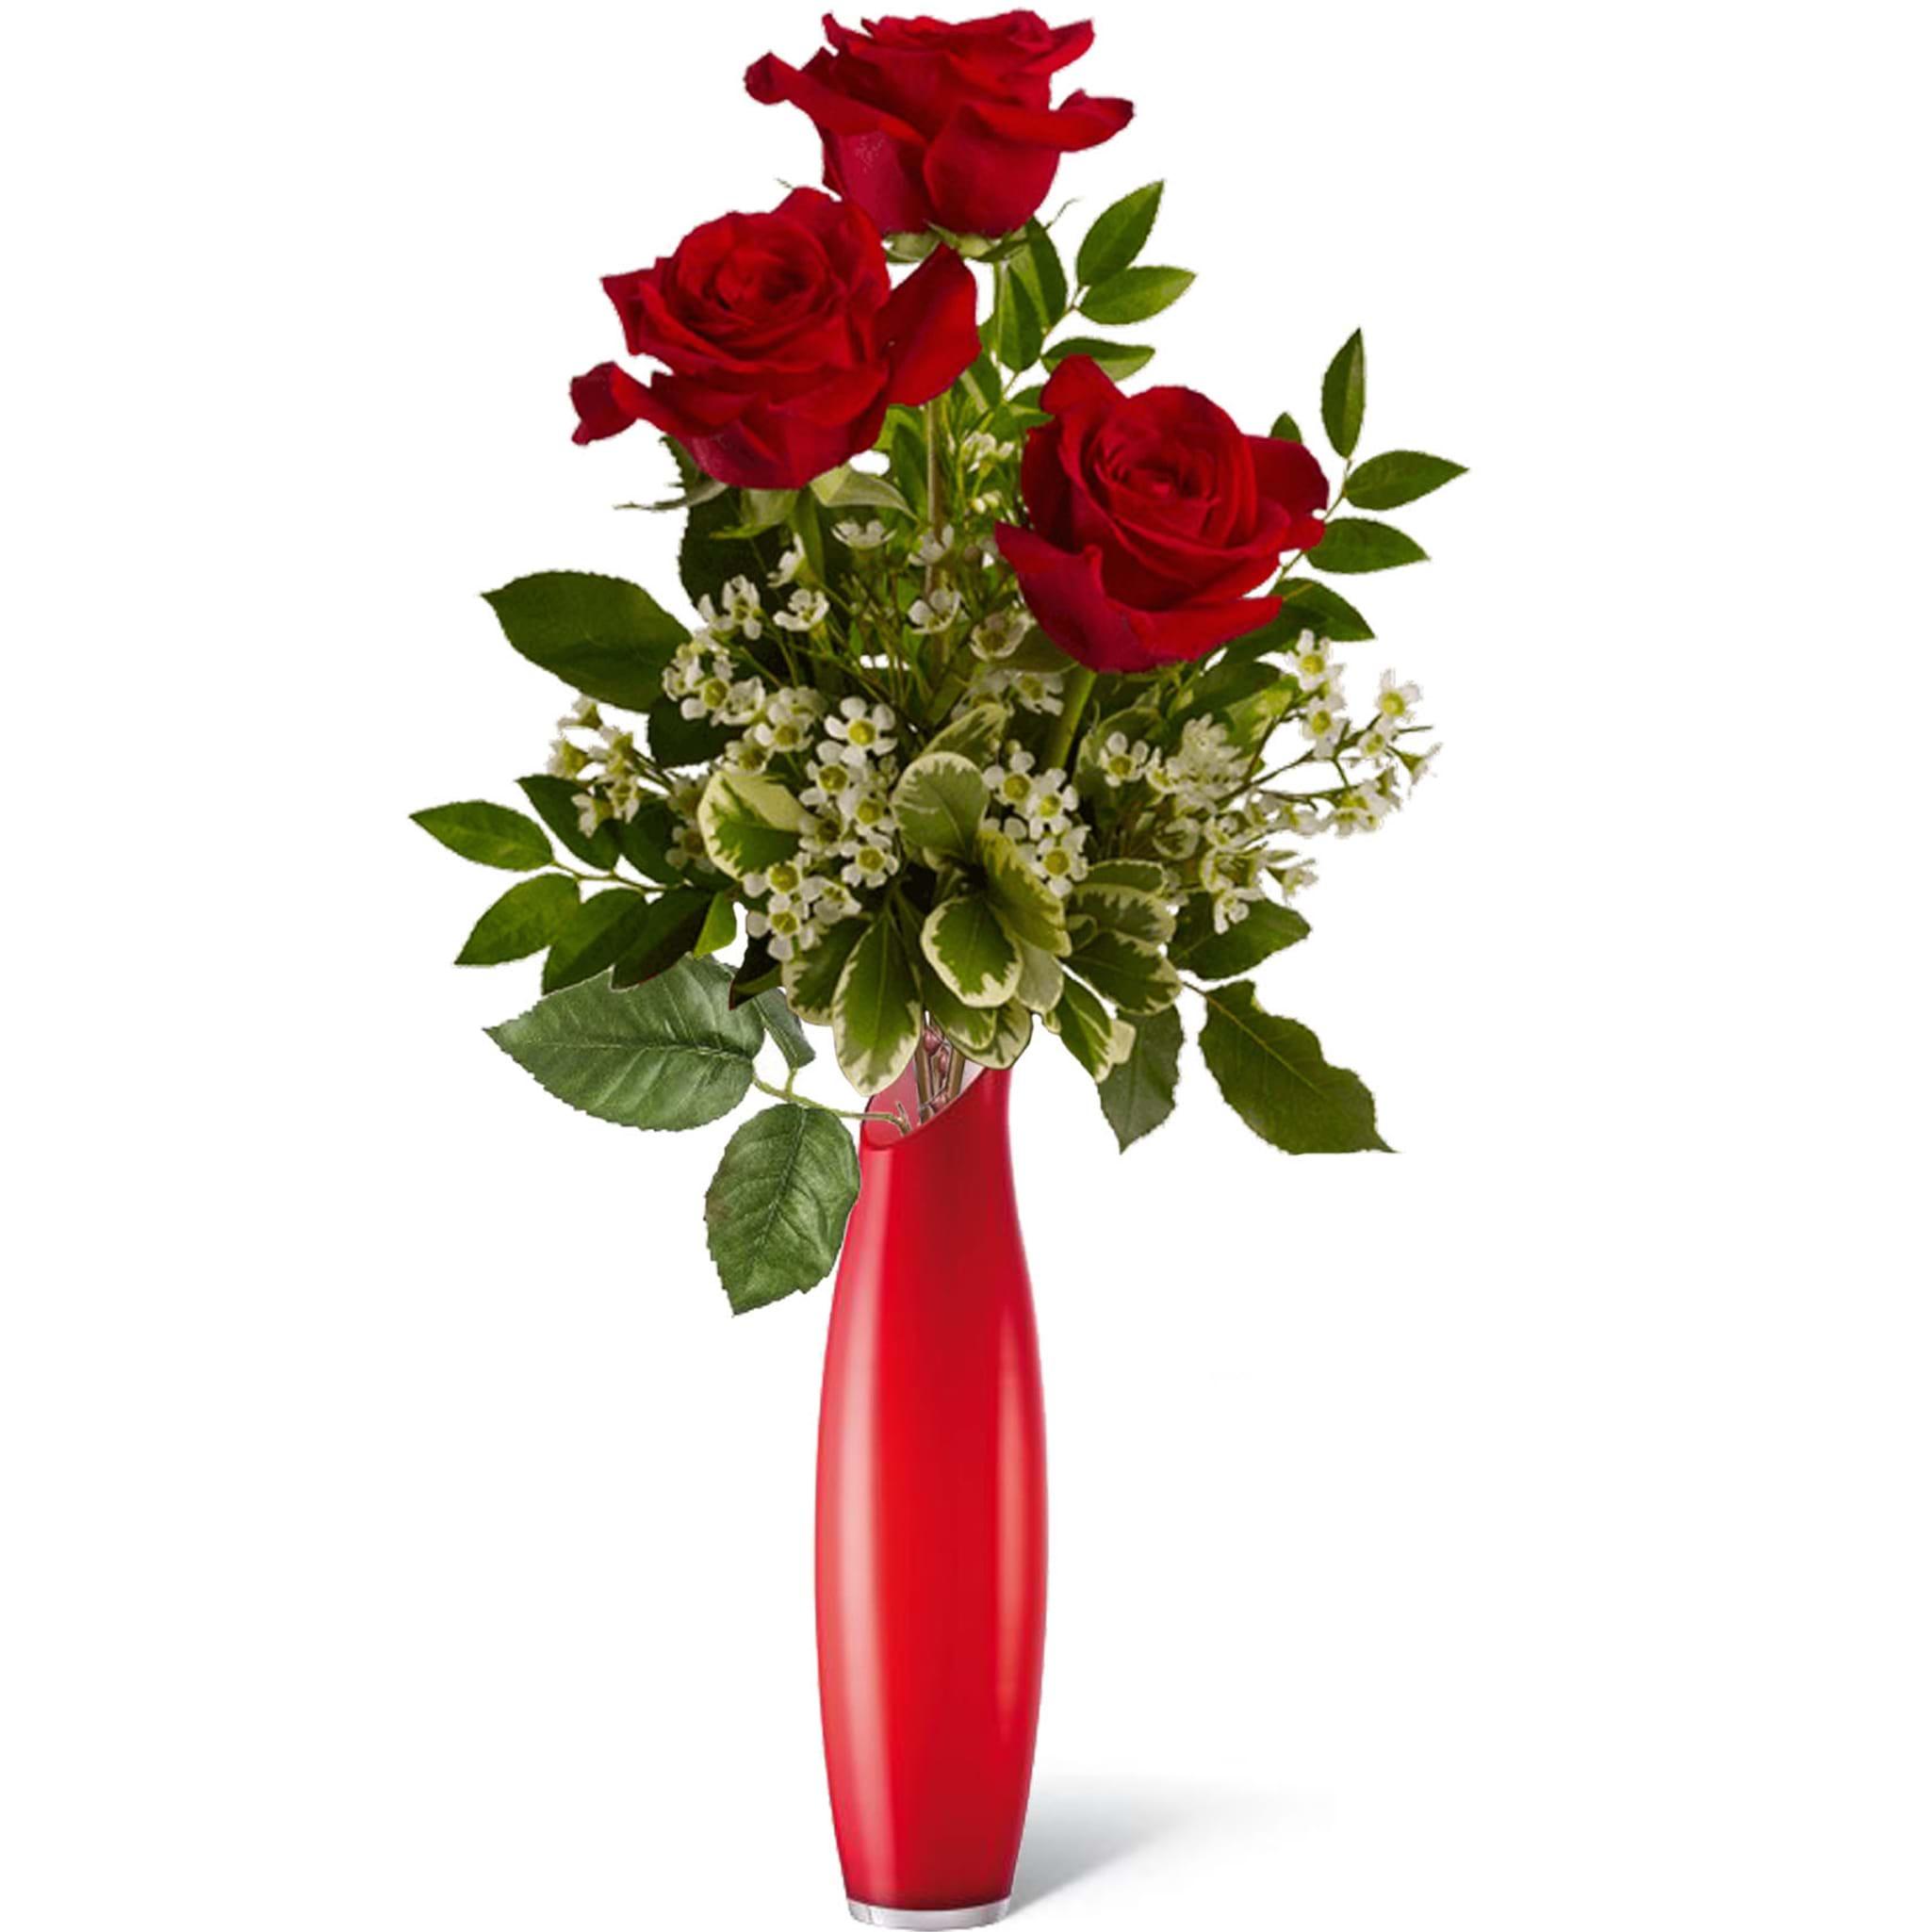 Spedire 3 rose rosse in vaso rosso